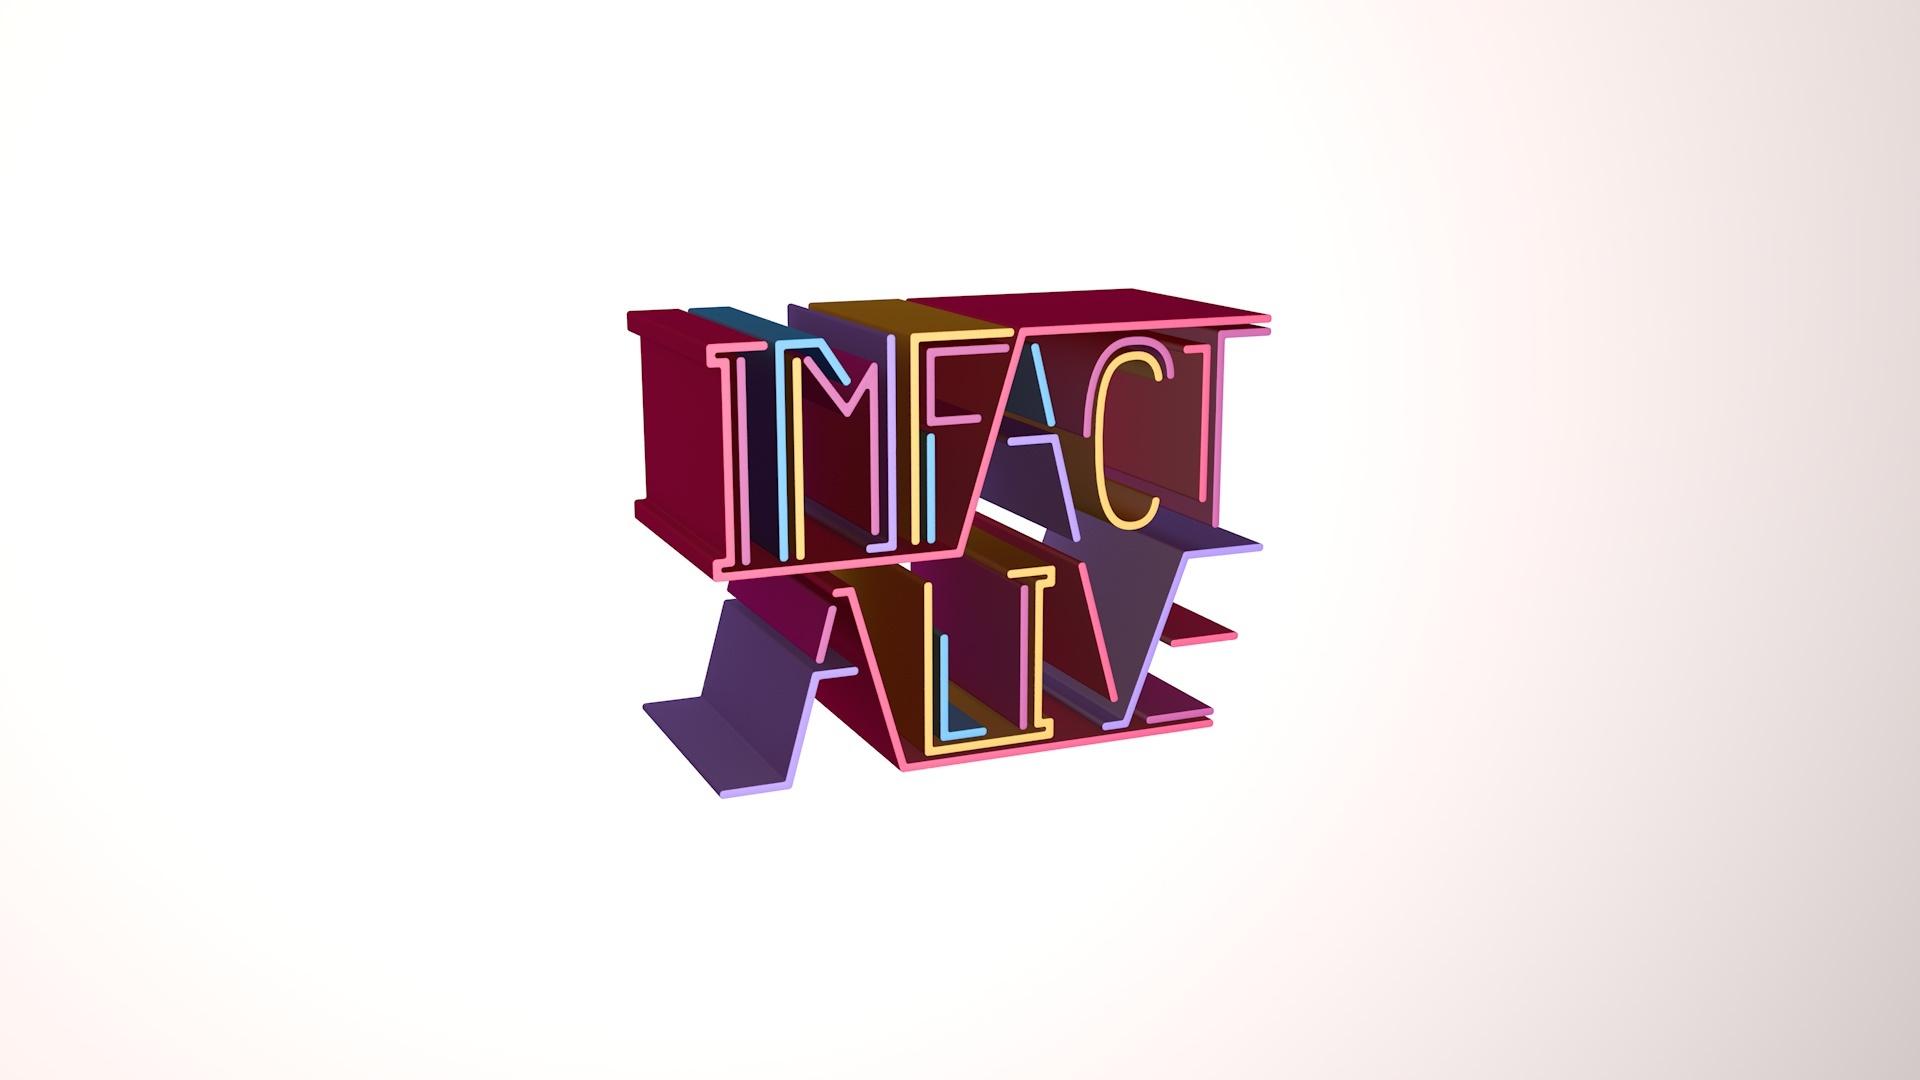 [IMFACT] 신인그룹 임팩트 리얼리티 'IMFACT ALIVE' 13편 - 스키장에서의 로맨스